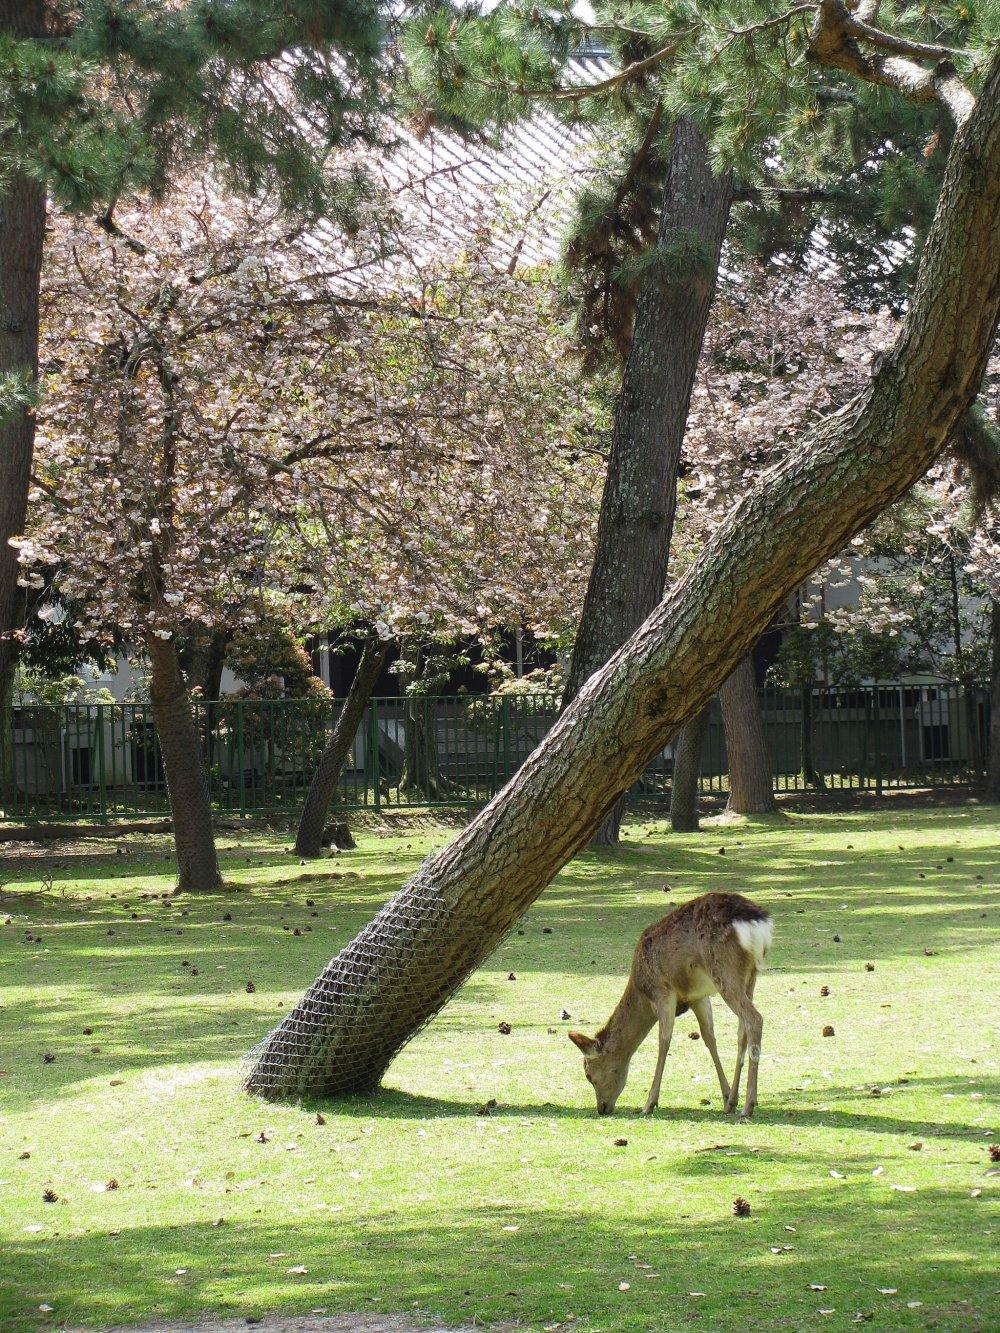 Wild Sika deer in Nara, Japan. Nara is a major tourism destination ...